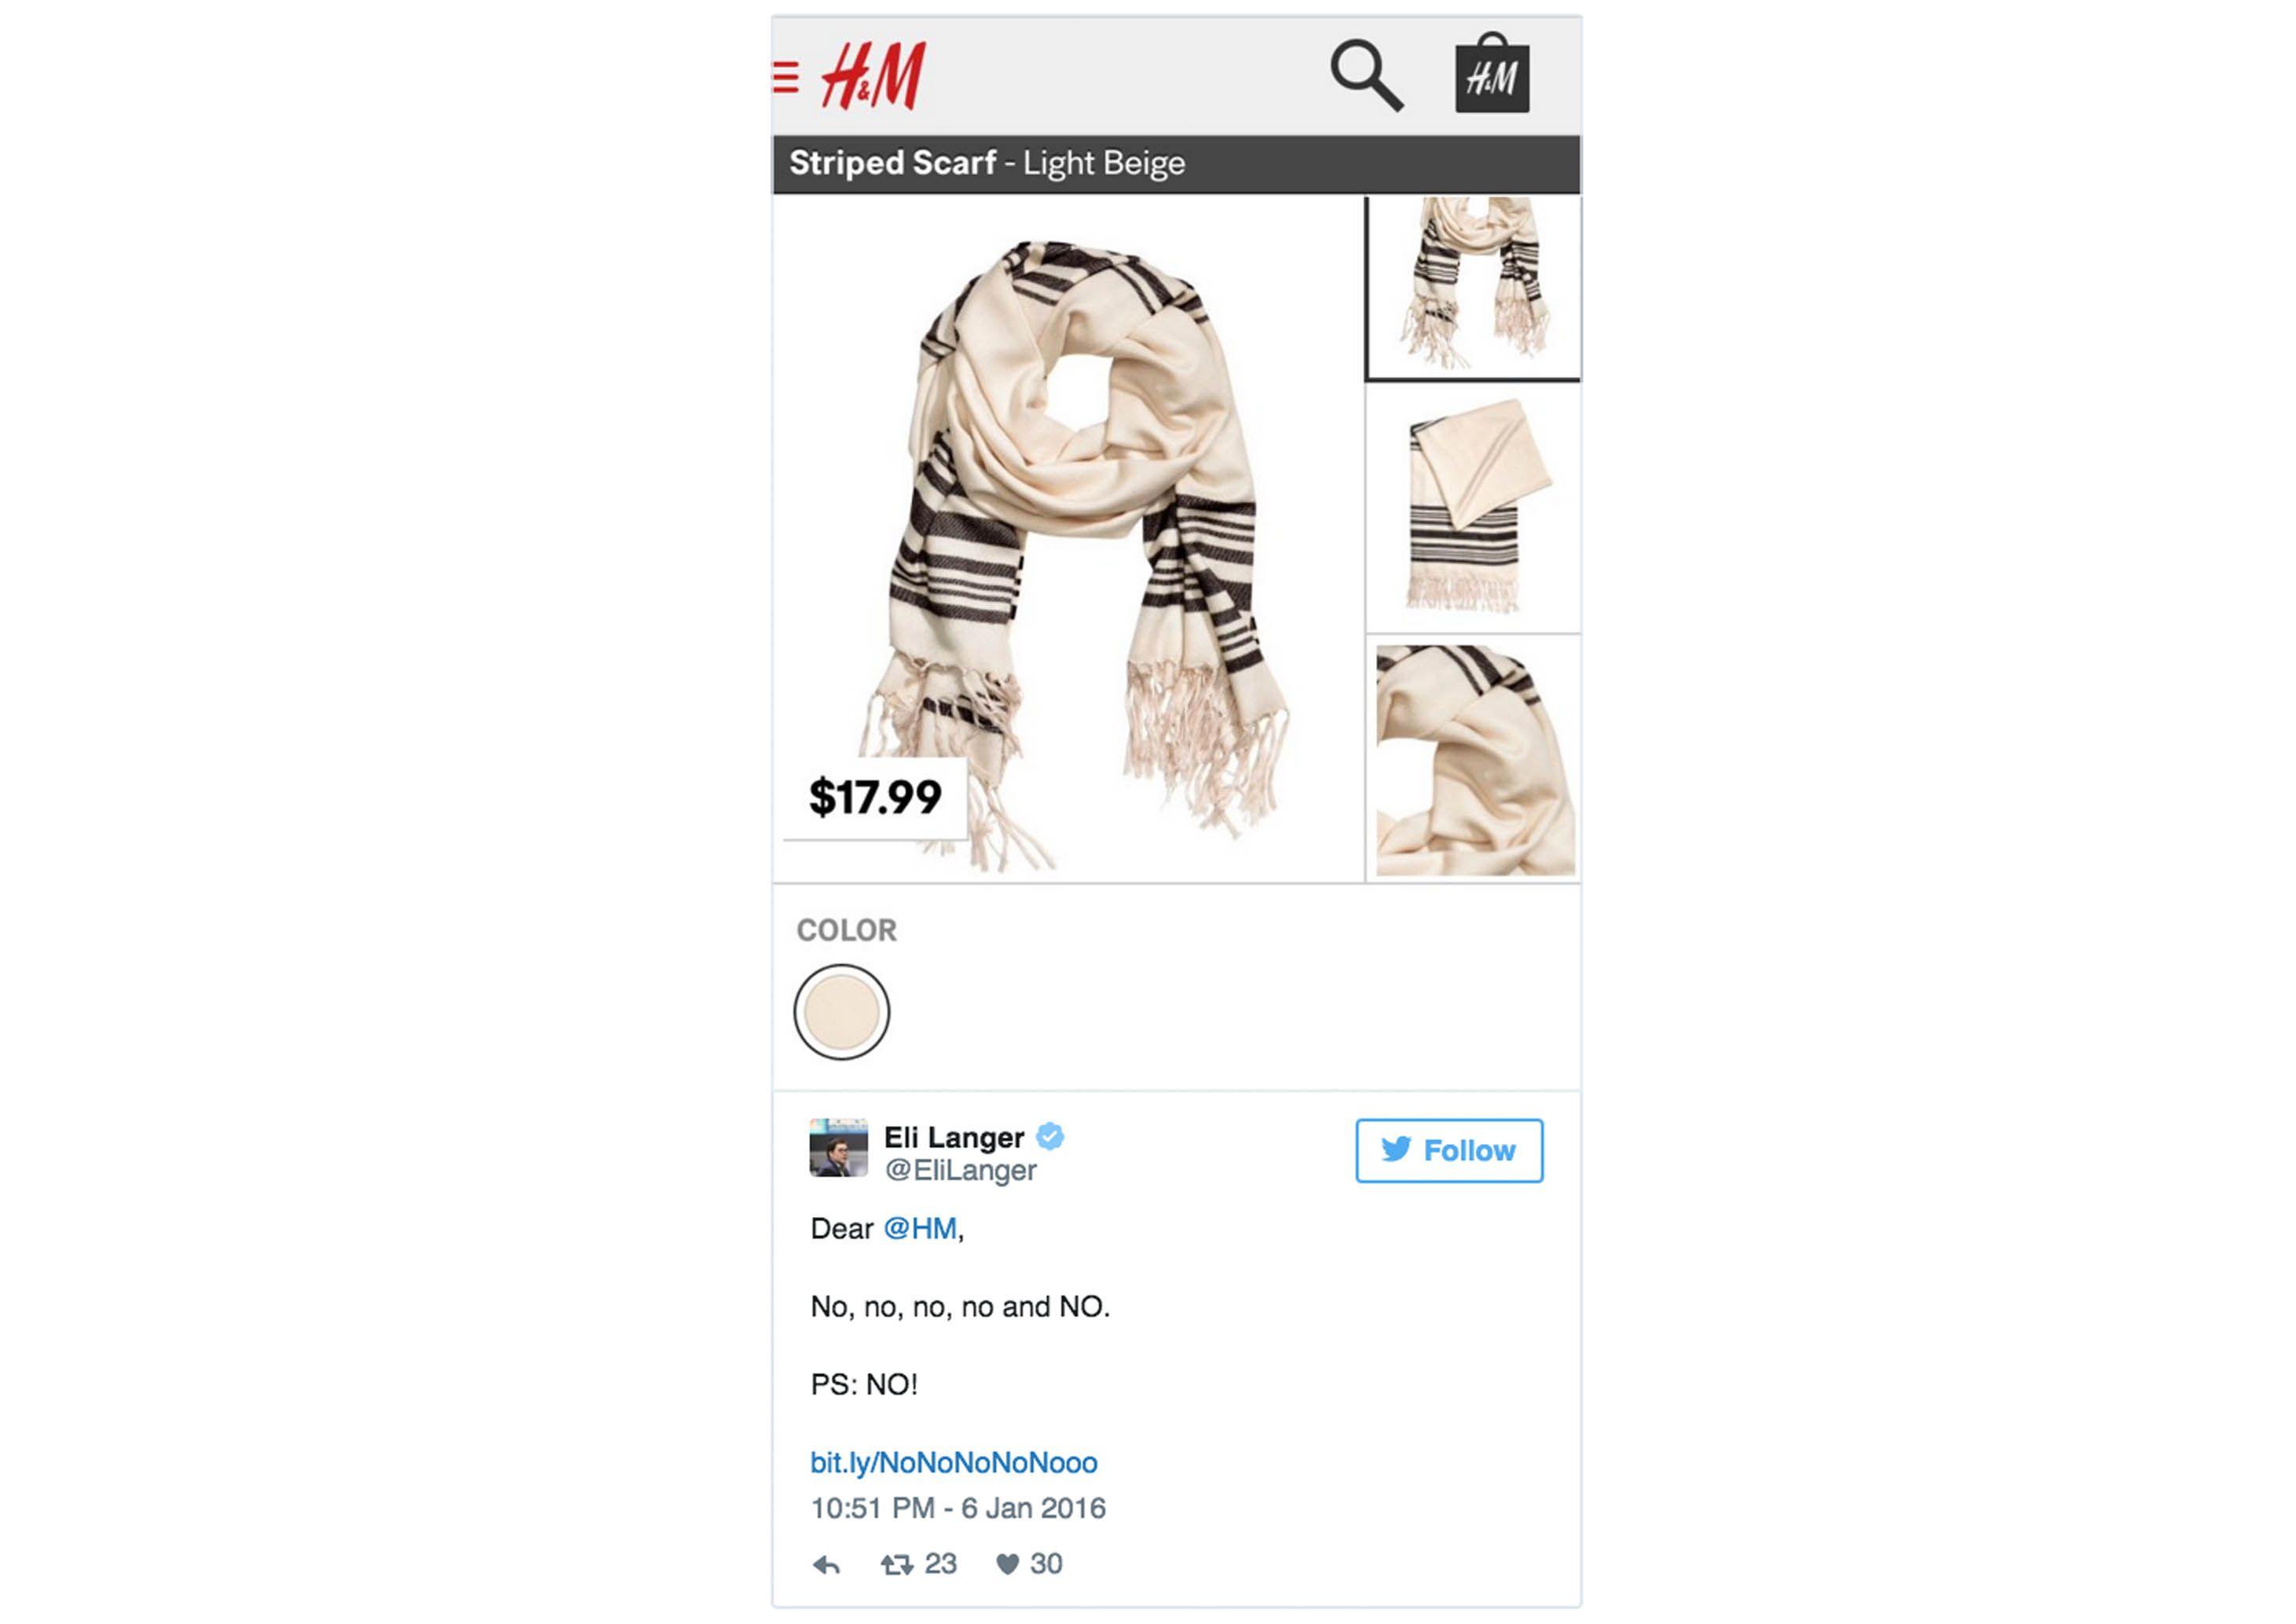 Kontroversial, Syal Keluaran Terbaru Ini Membuat H&M Meminta Maaf Kepada Warga Israel